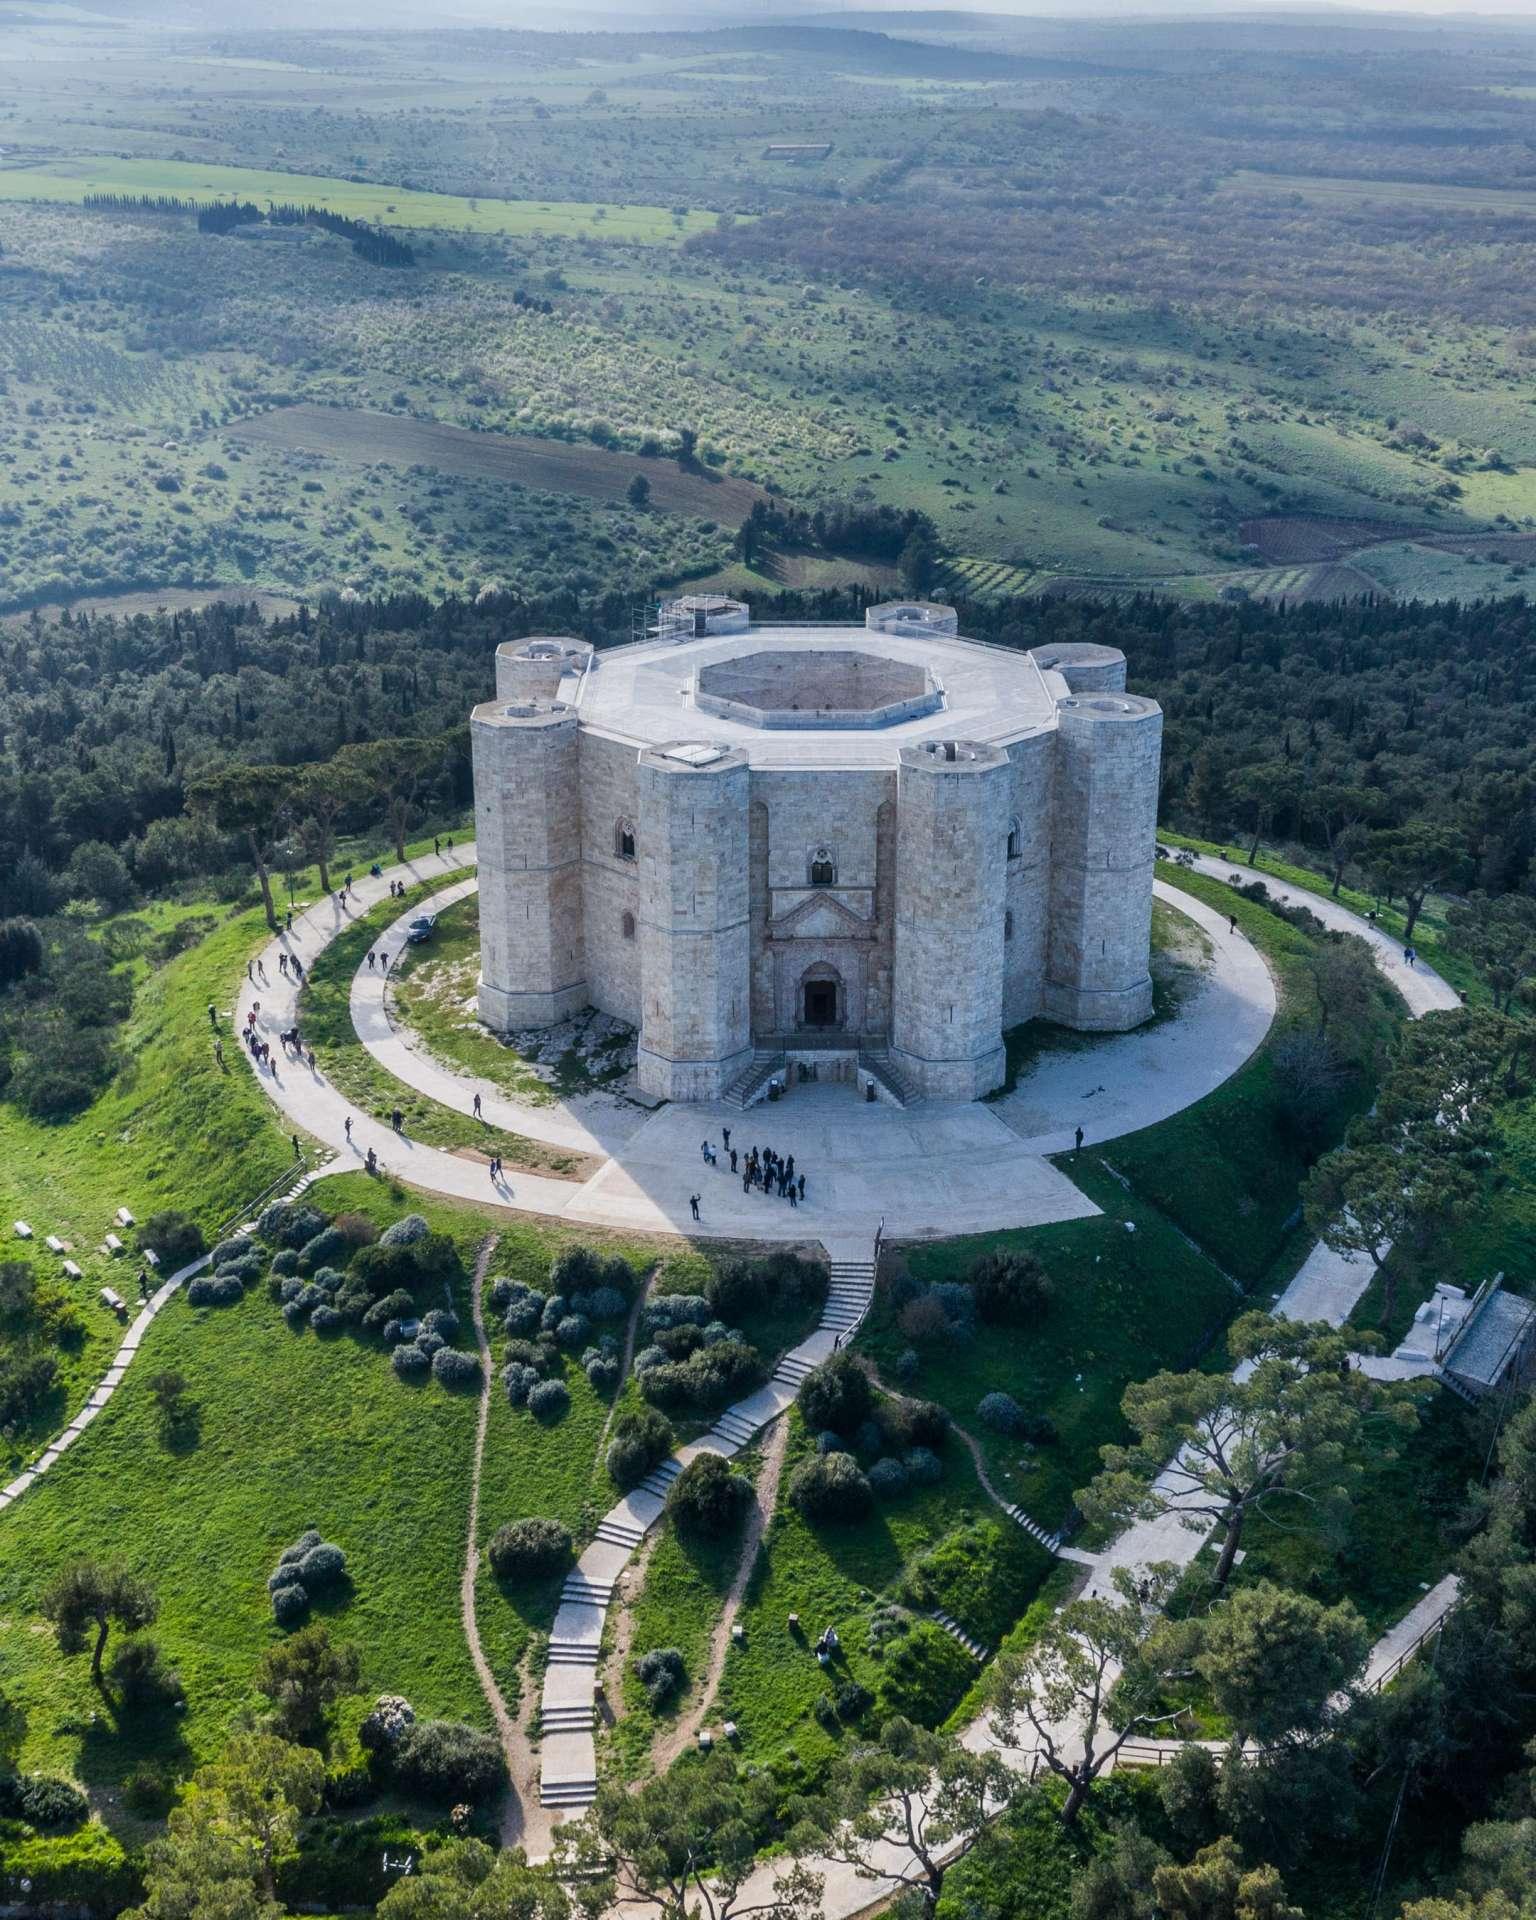 Castel Del Monte Drone Aerial View